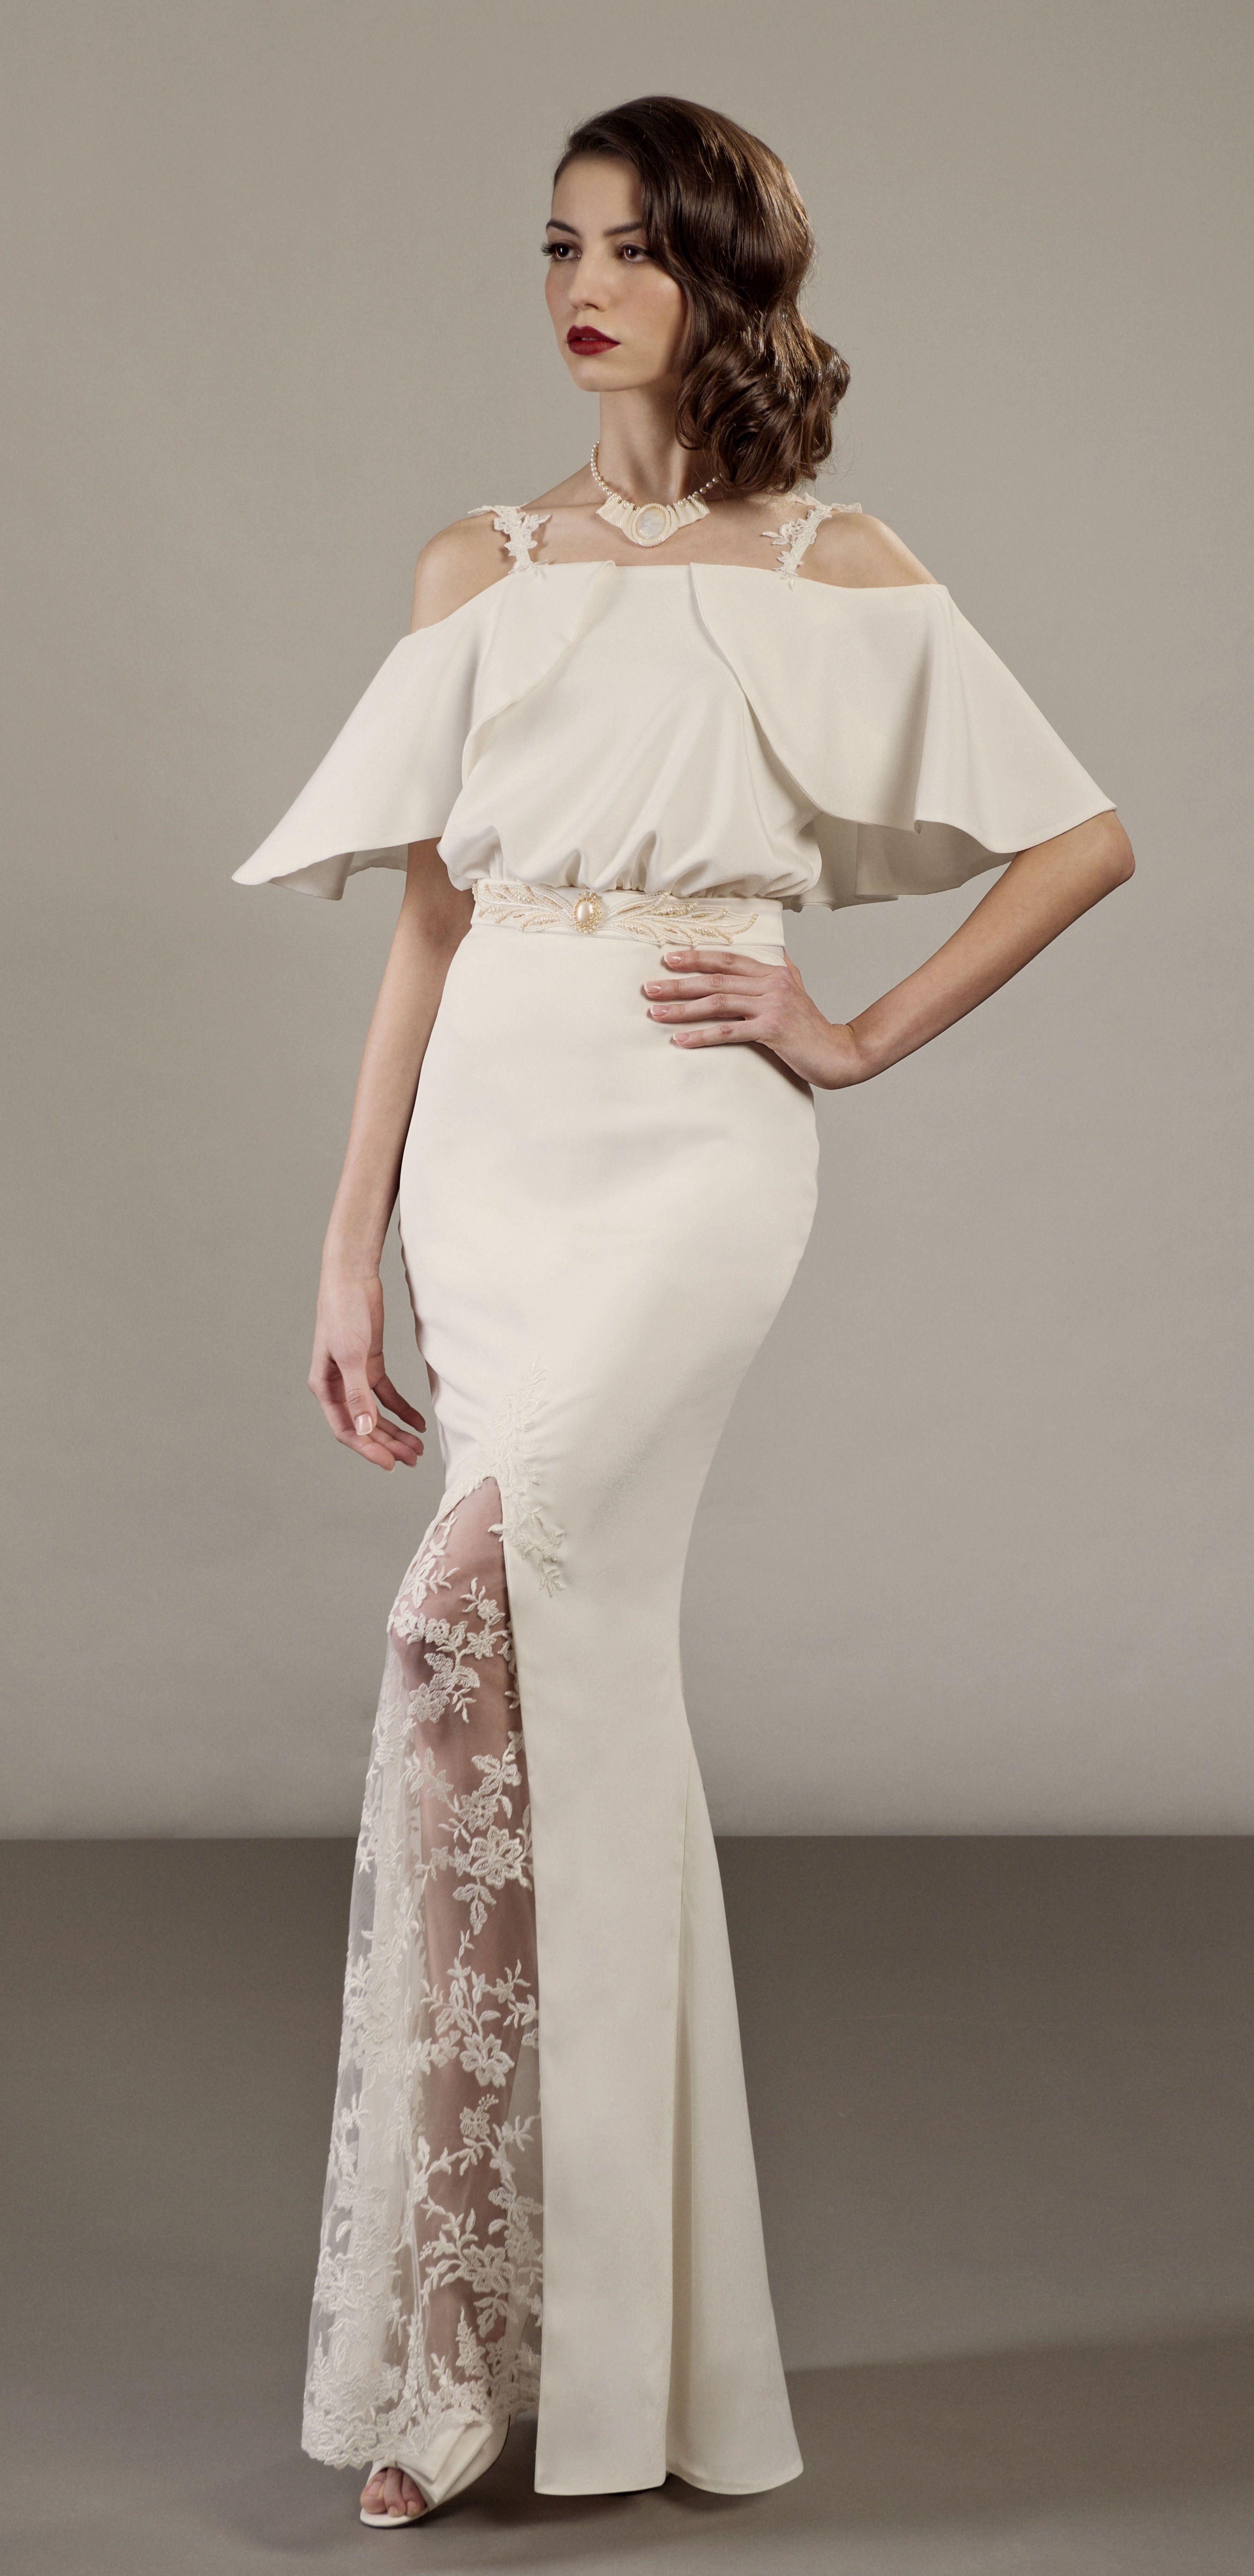 30's silhouette vintage inspired unique wedding dress